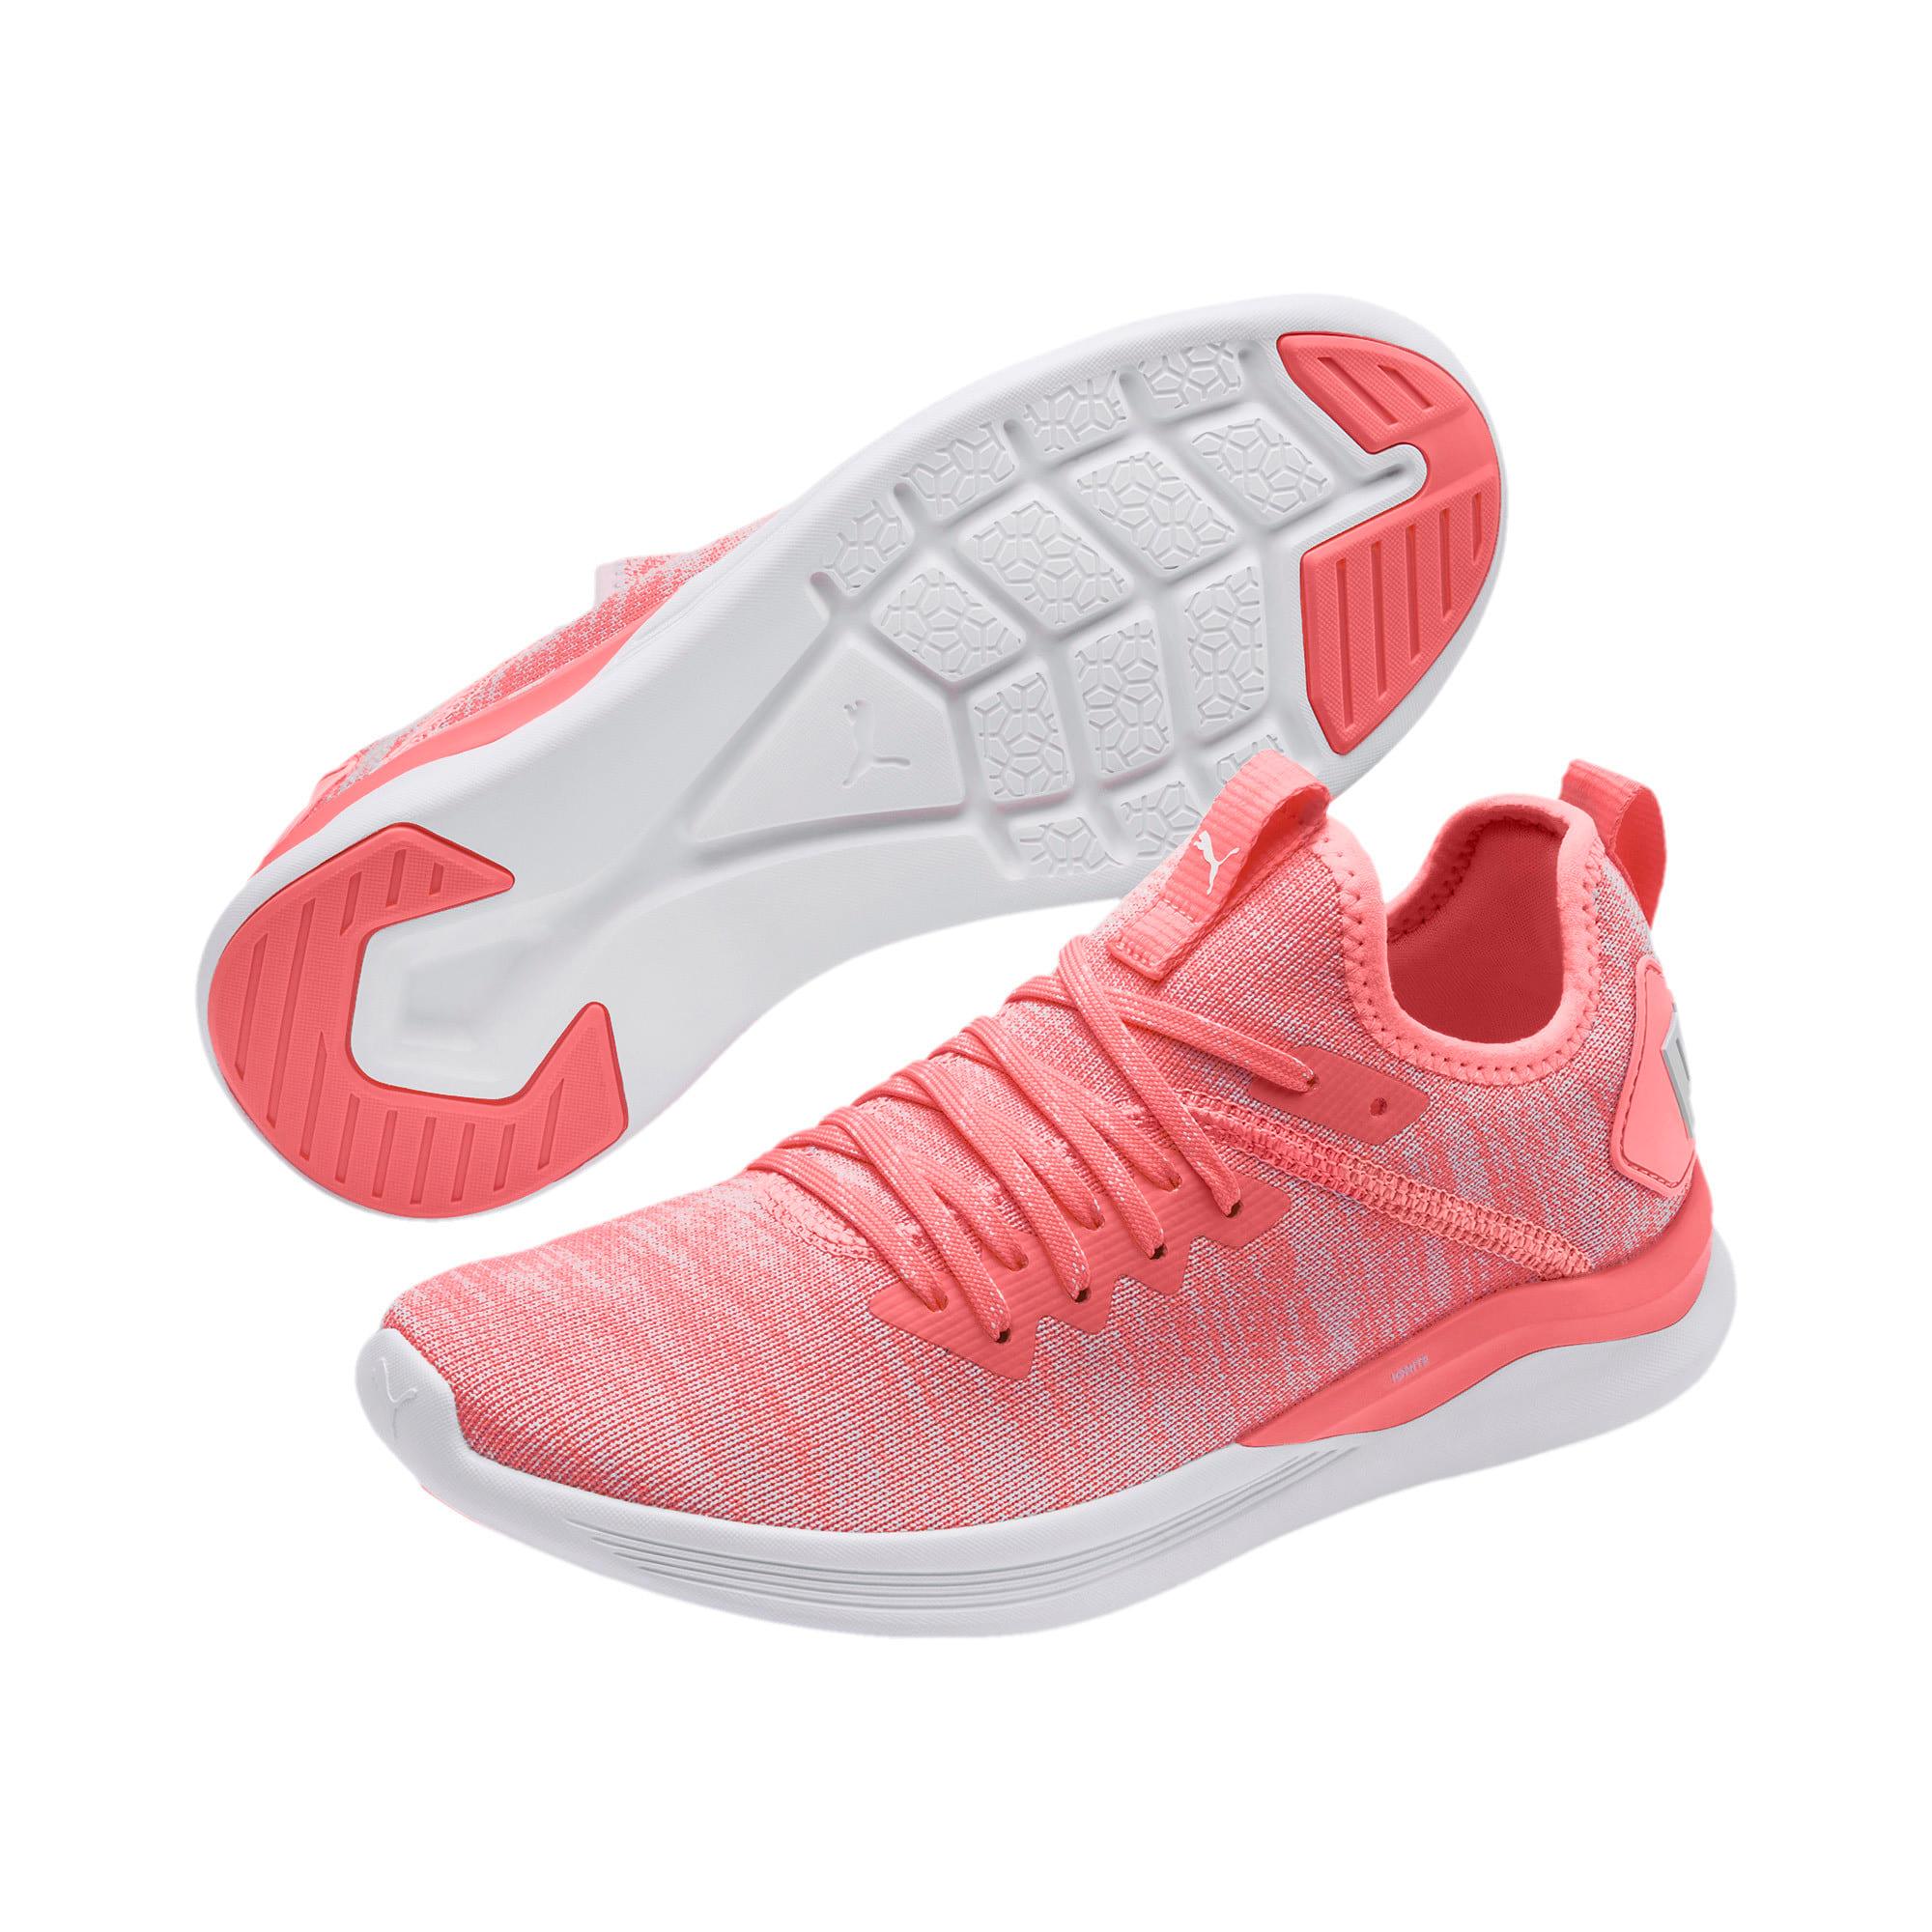 Thumbnail 3 of IGNITE Flash evoKNIT Women's Running Shoes, Bright Peach-Puma White, medium